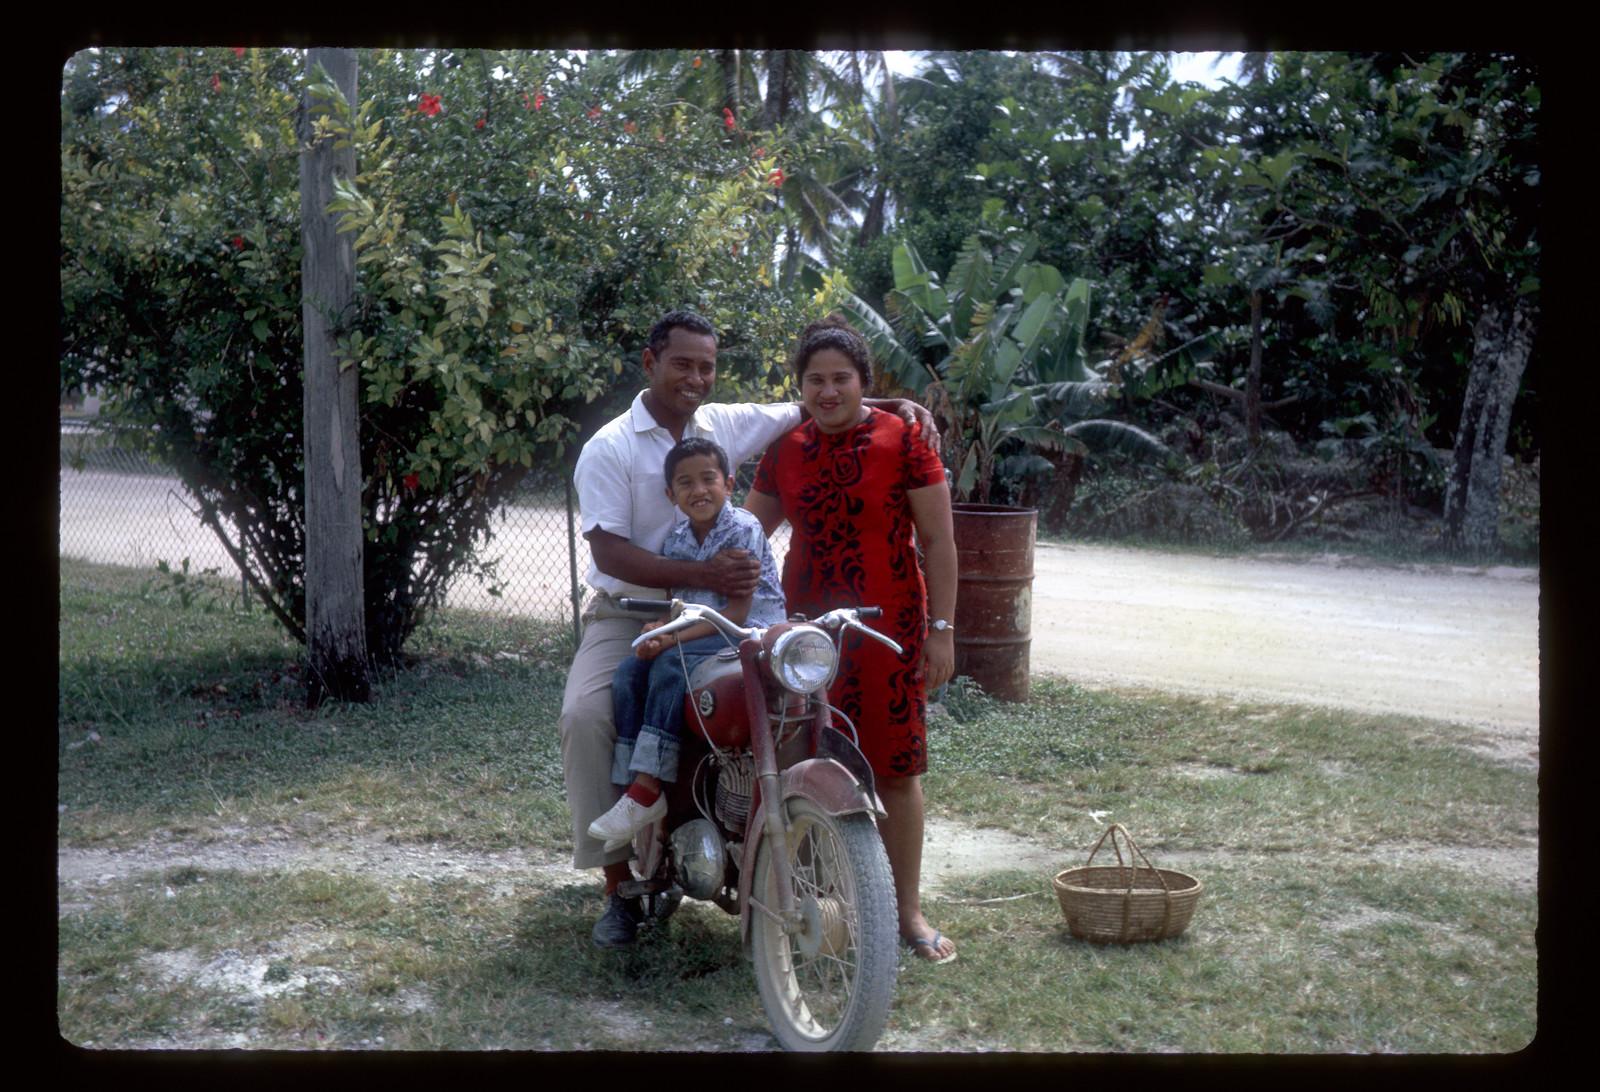 Feki Po'uha with his wife, Foli, and son Joe in August 1966 in Tonga.